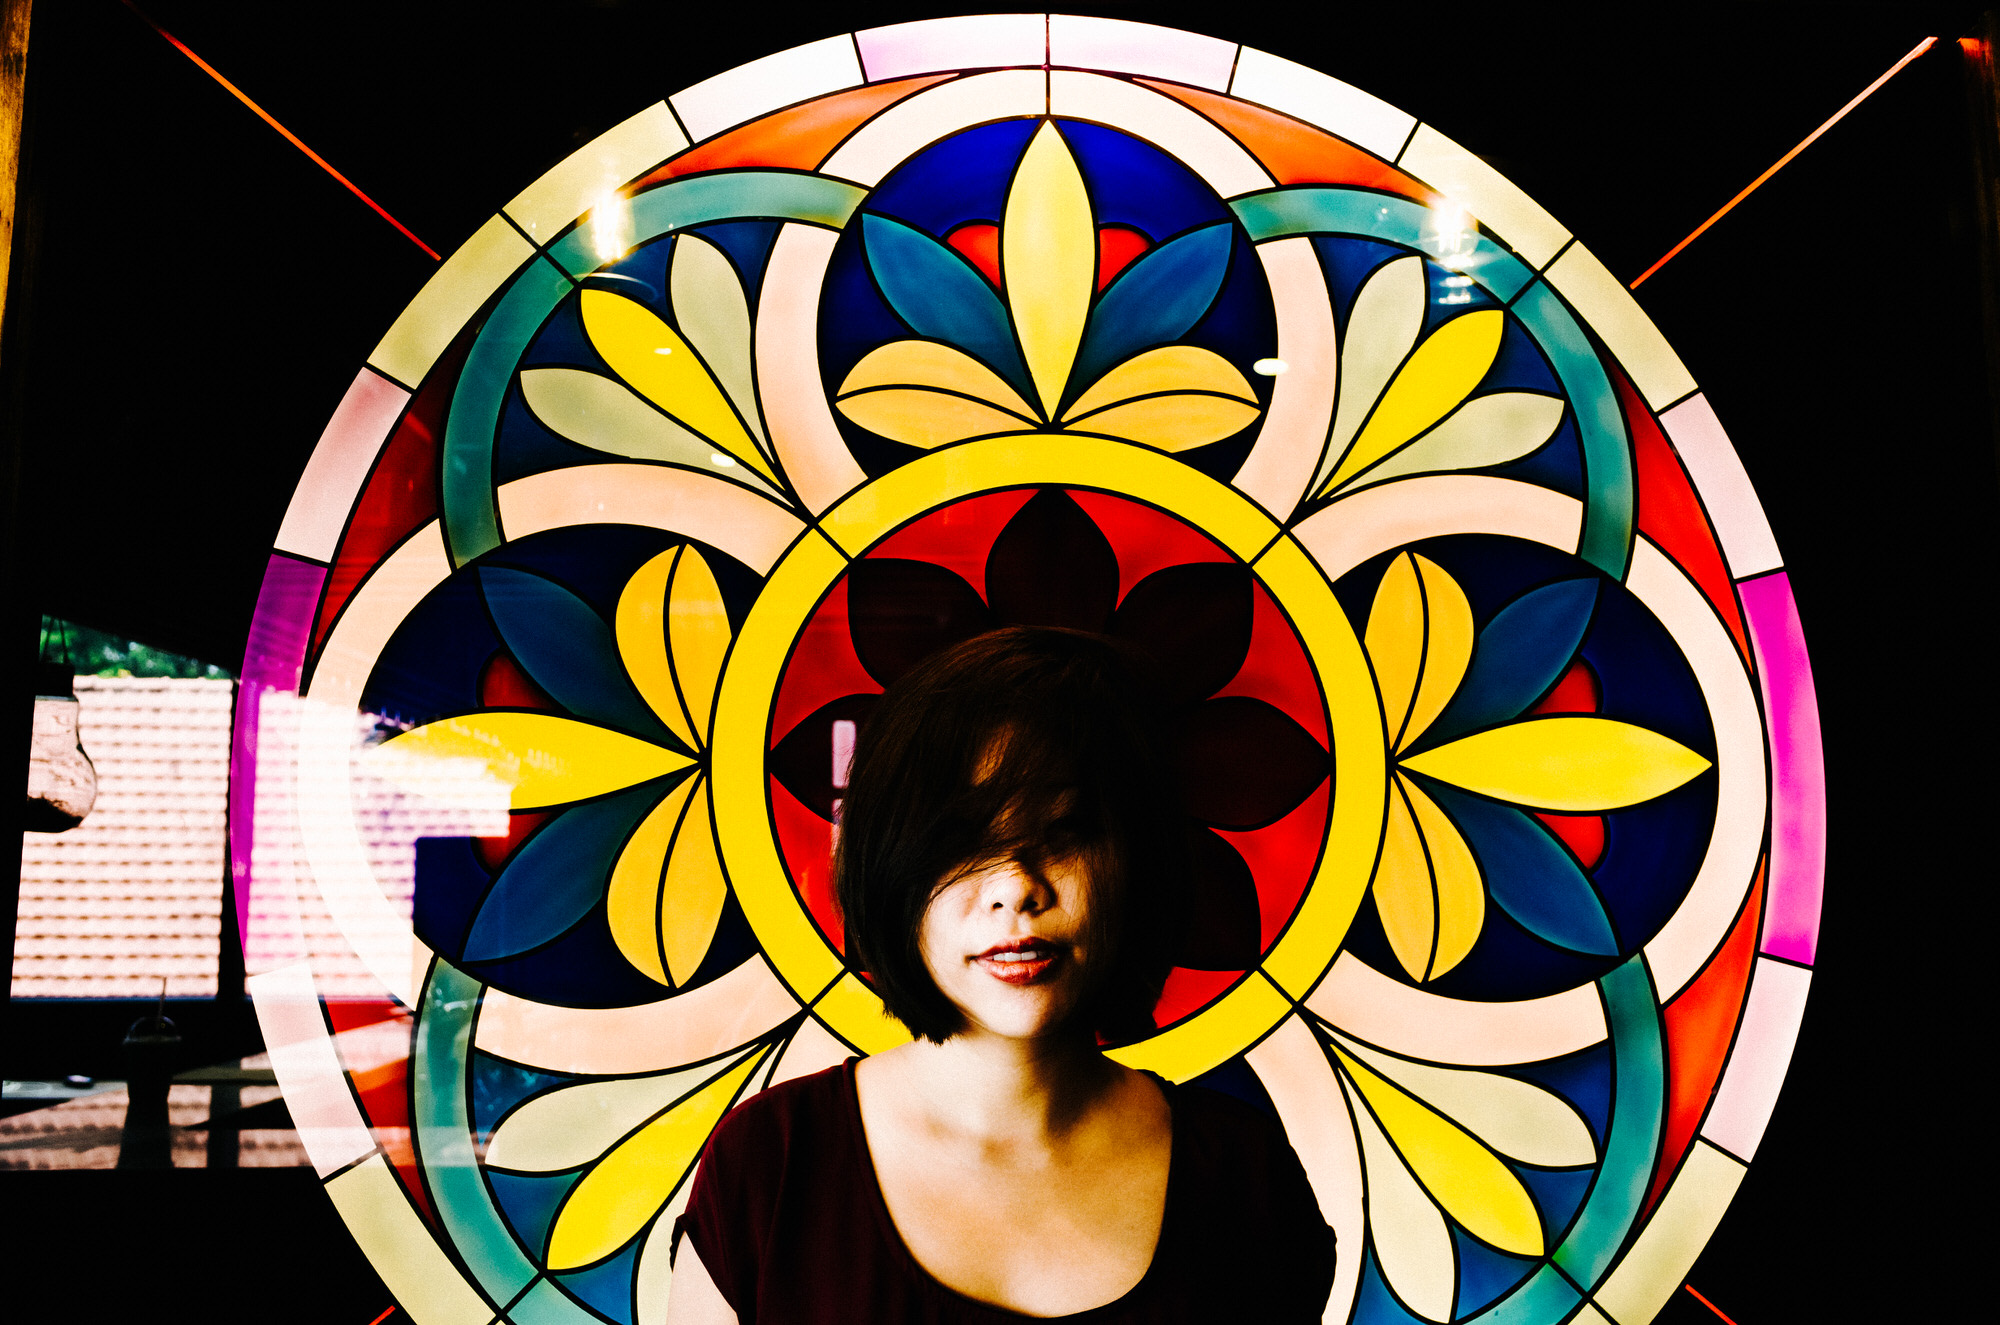 eric kim street photography hanoi - color-0000752